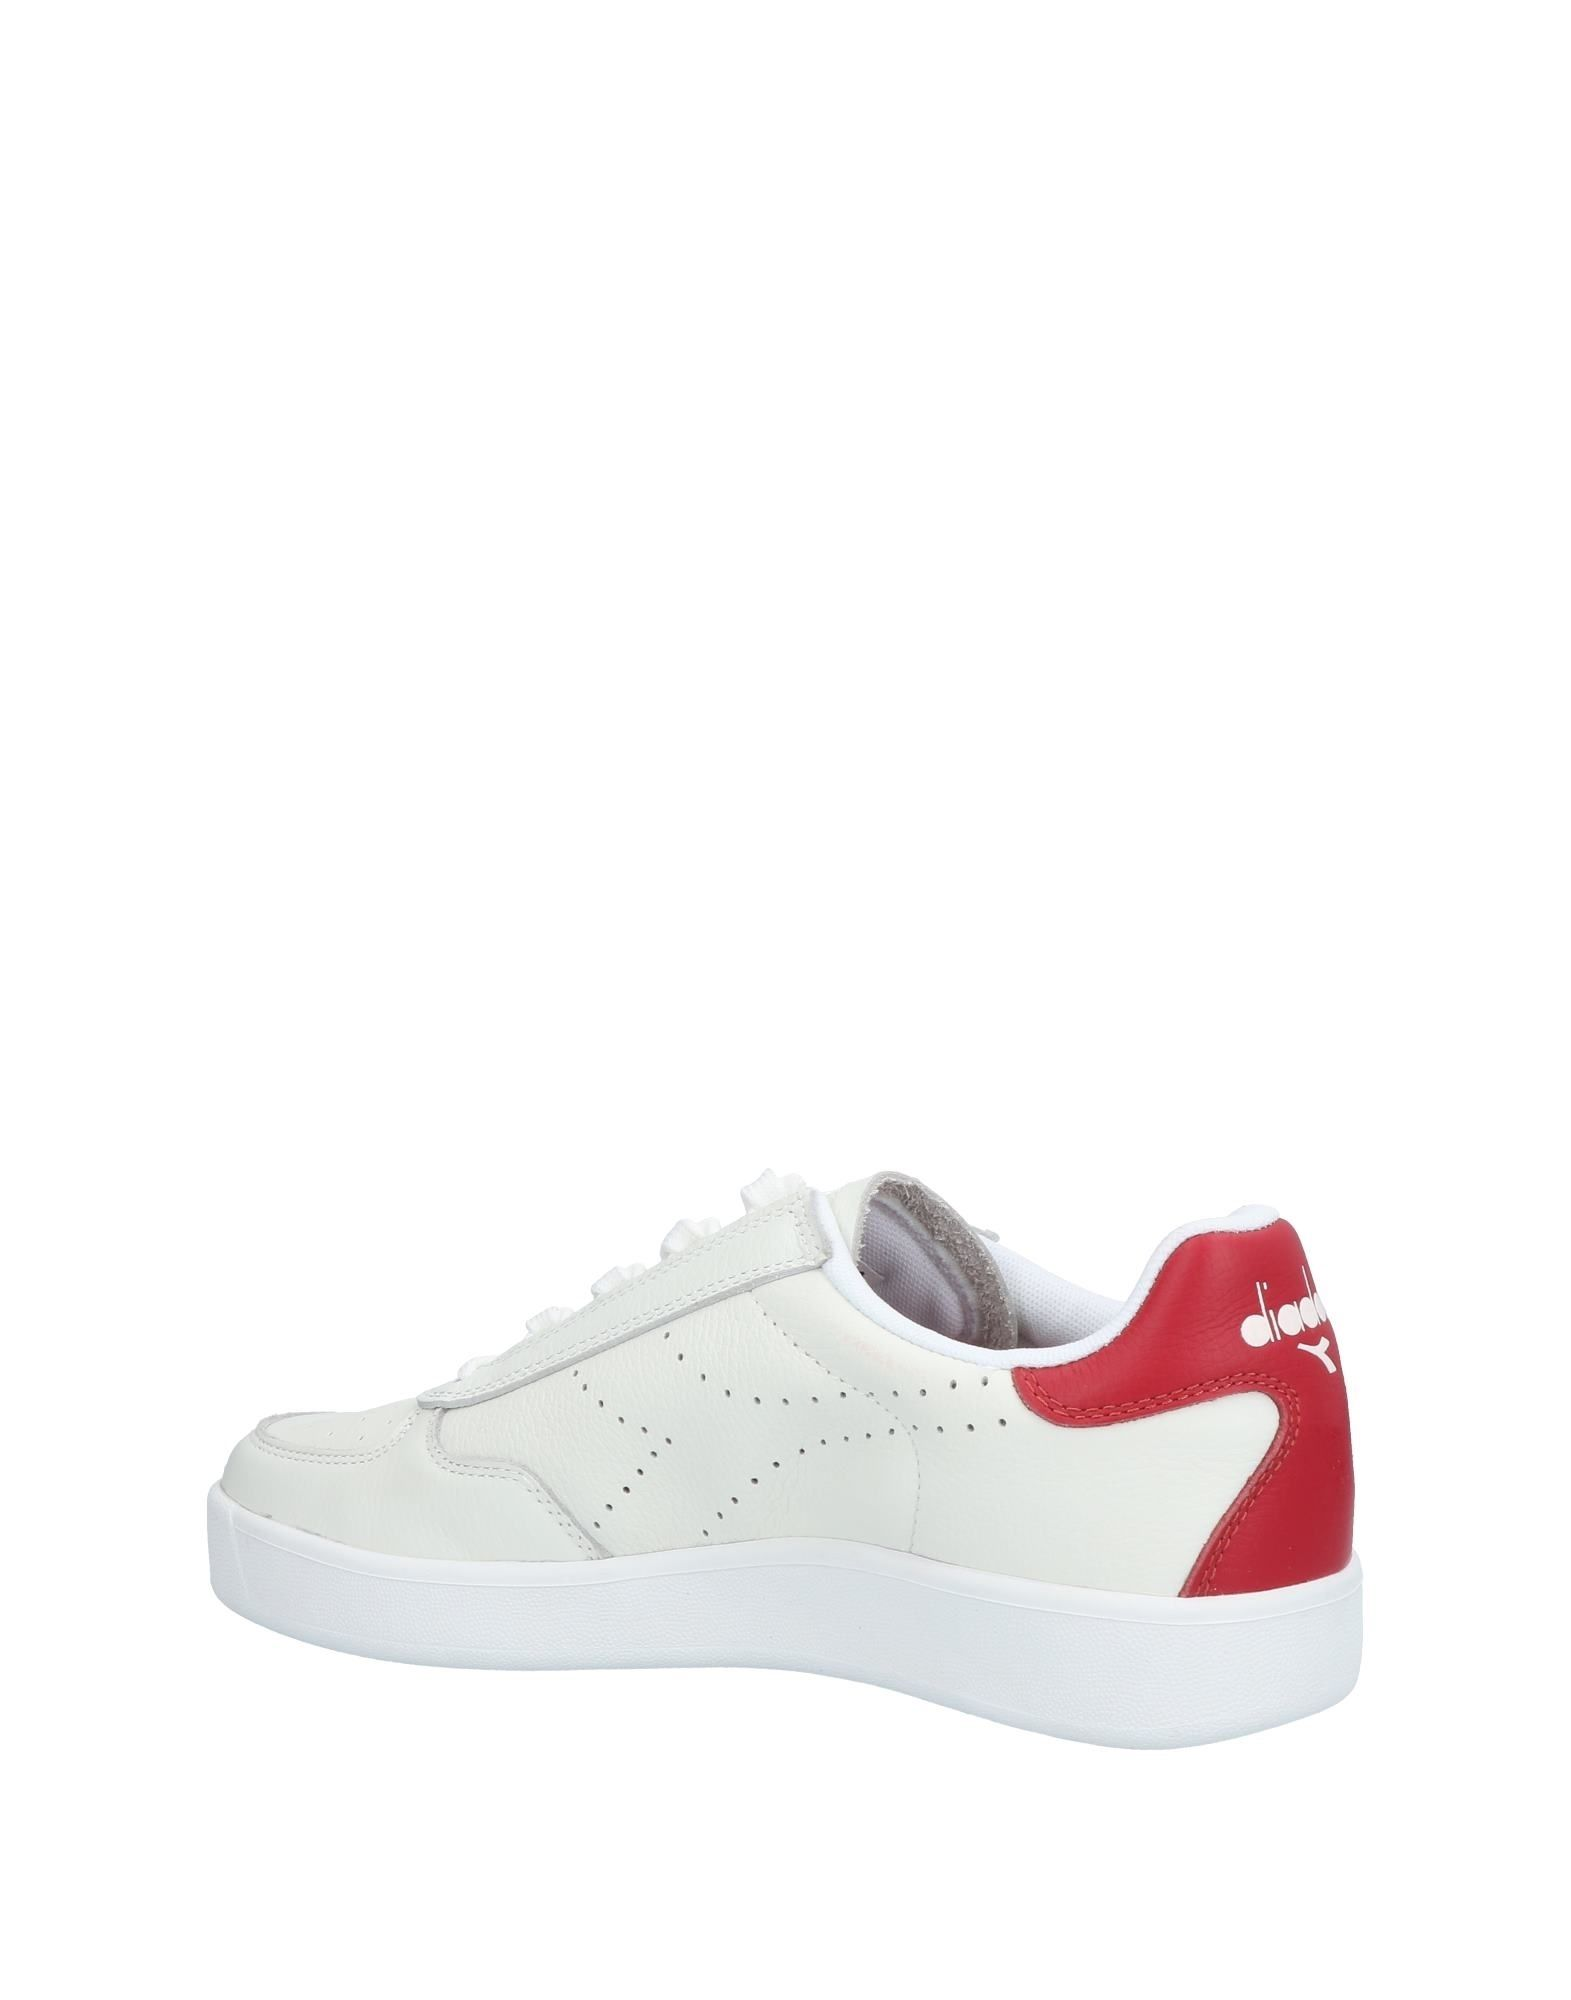 Rabatt Herren echte Schuhe Diadora Sneakers Herren Rabatt  11429192XX b79888